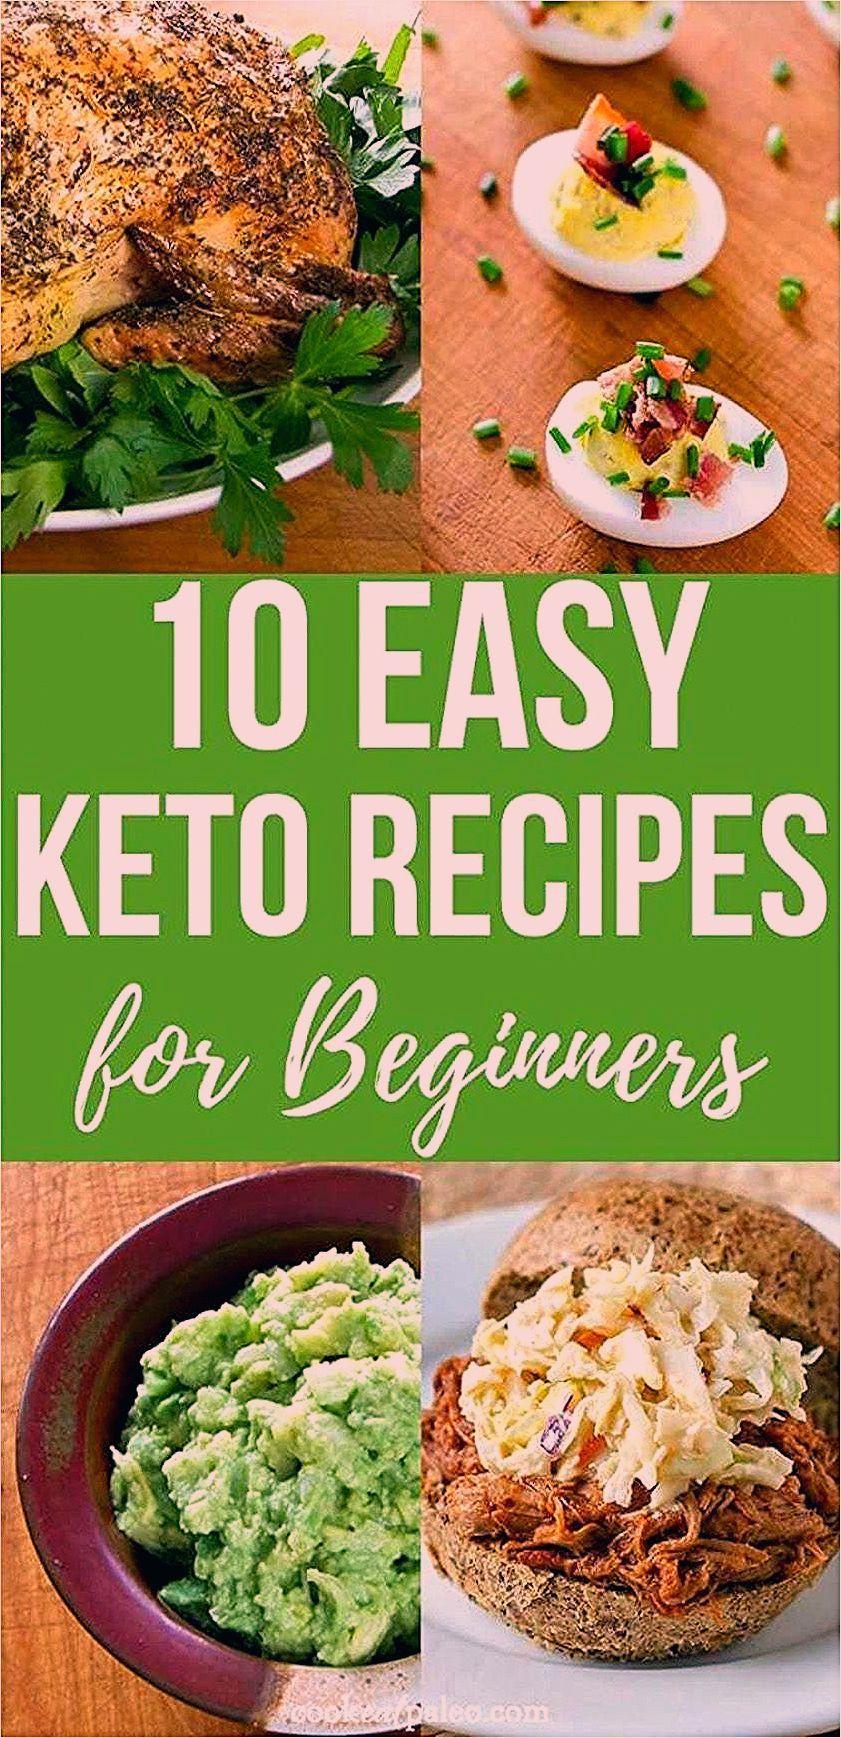 keto diet for beginners meal plan keto diet for beginners meal plan week 1 keto